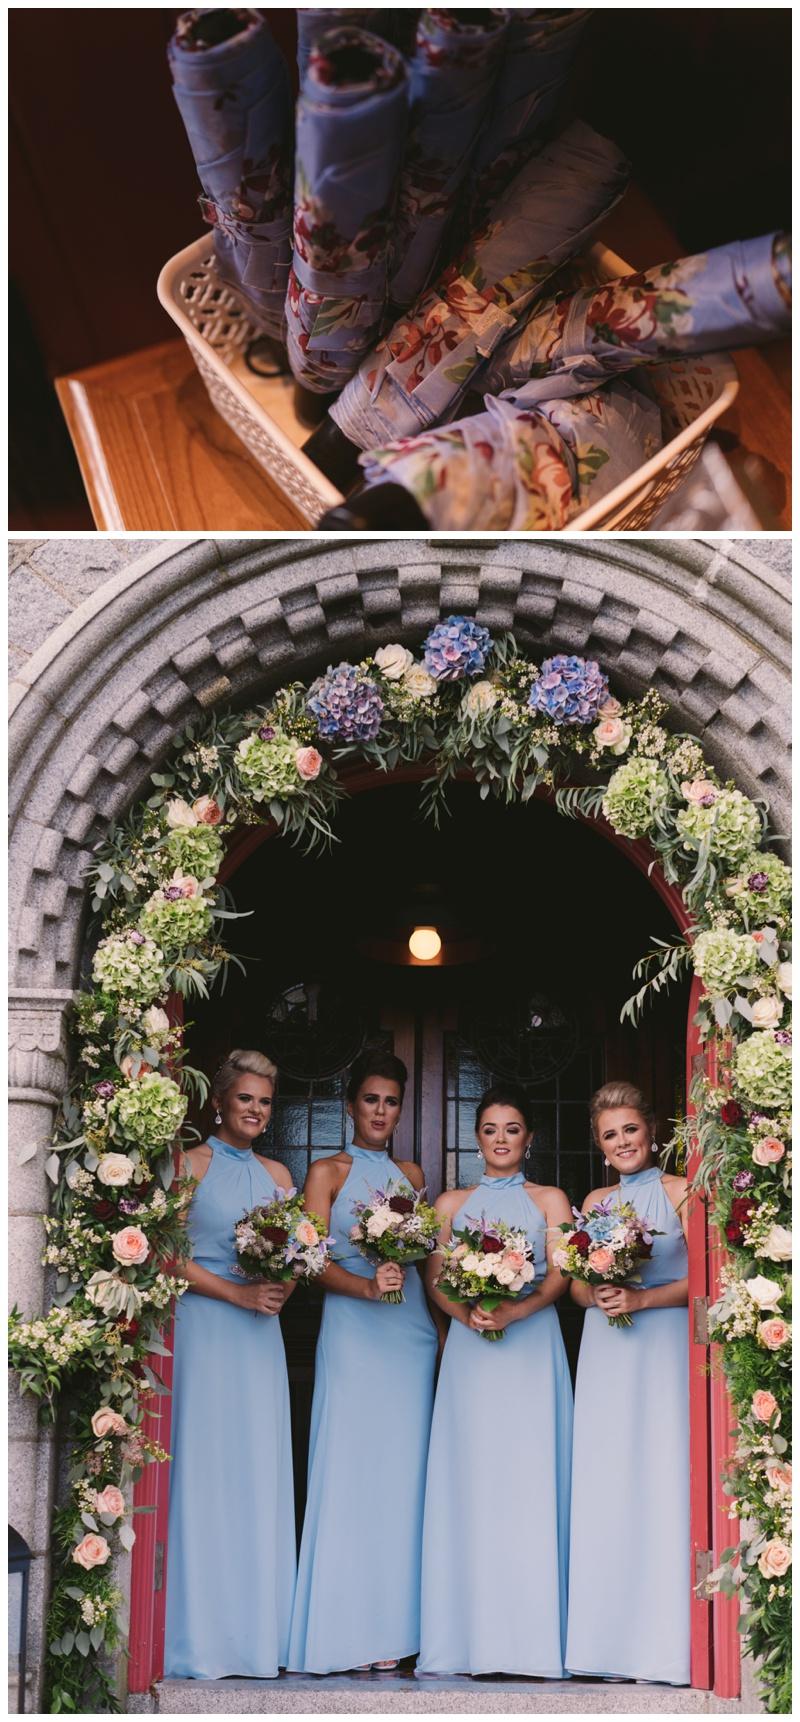 bellingham_castle_wedding_photographer_ireland_0036.jpg